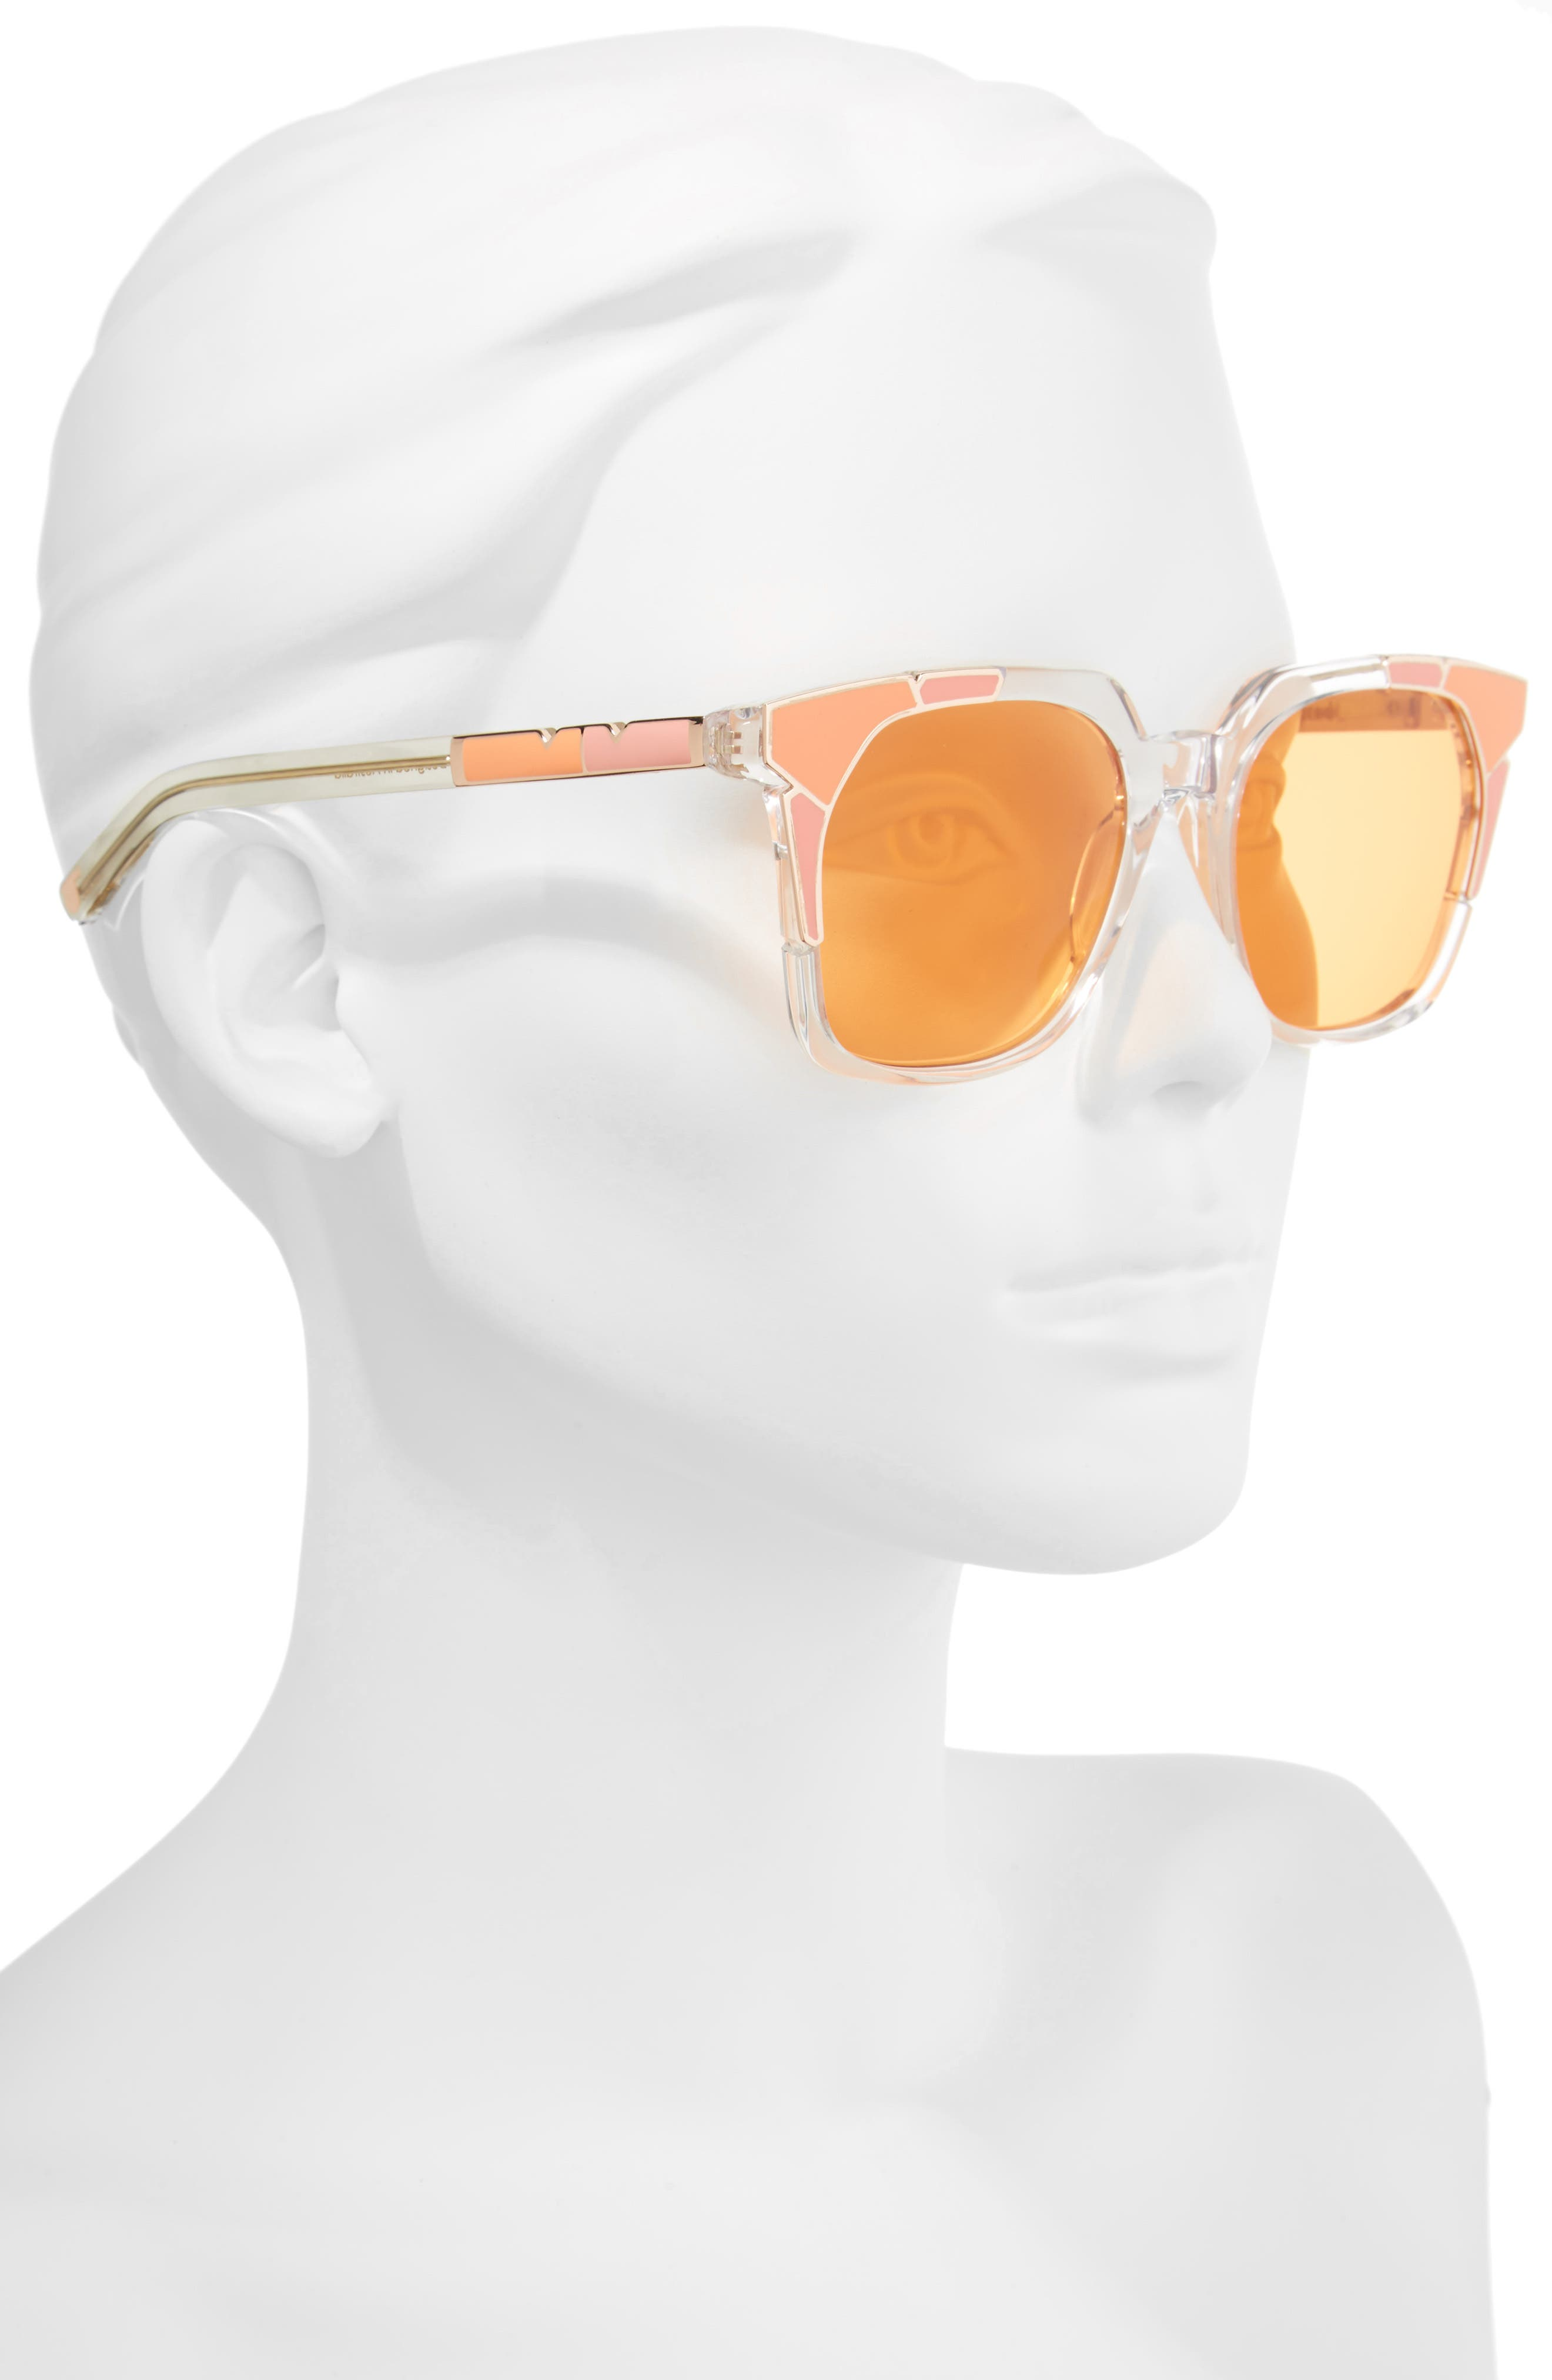 Tutti & Frutti 55mm Sunglasses,                             Alternate thumbnail 2, color,                             SALMON ORANGE/ ROSE GOLD